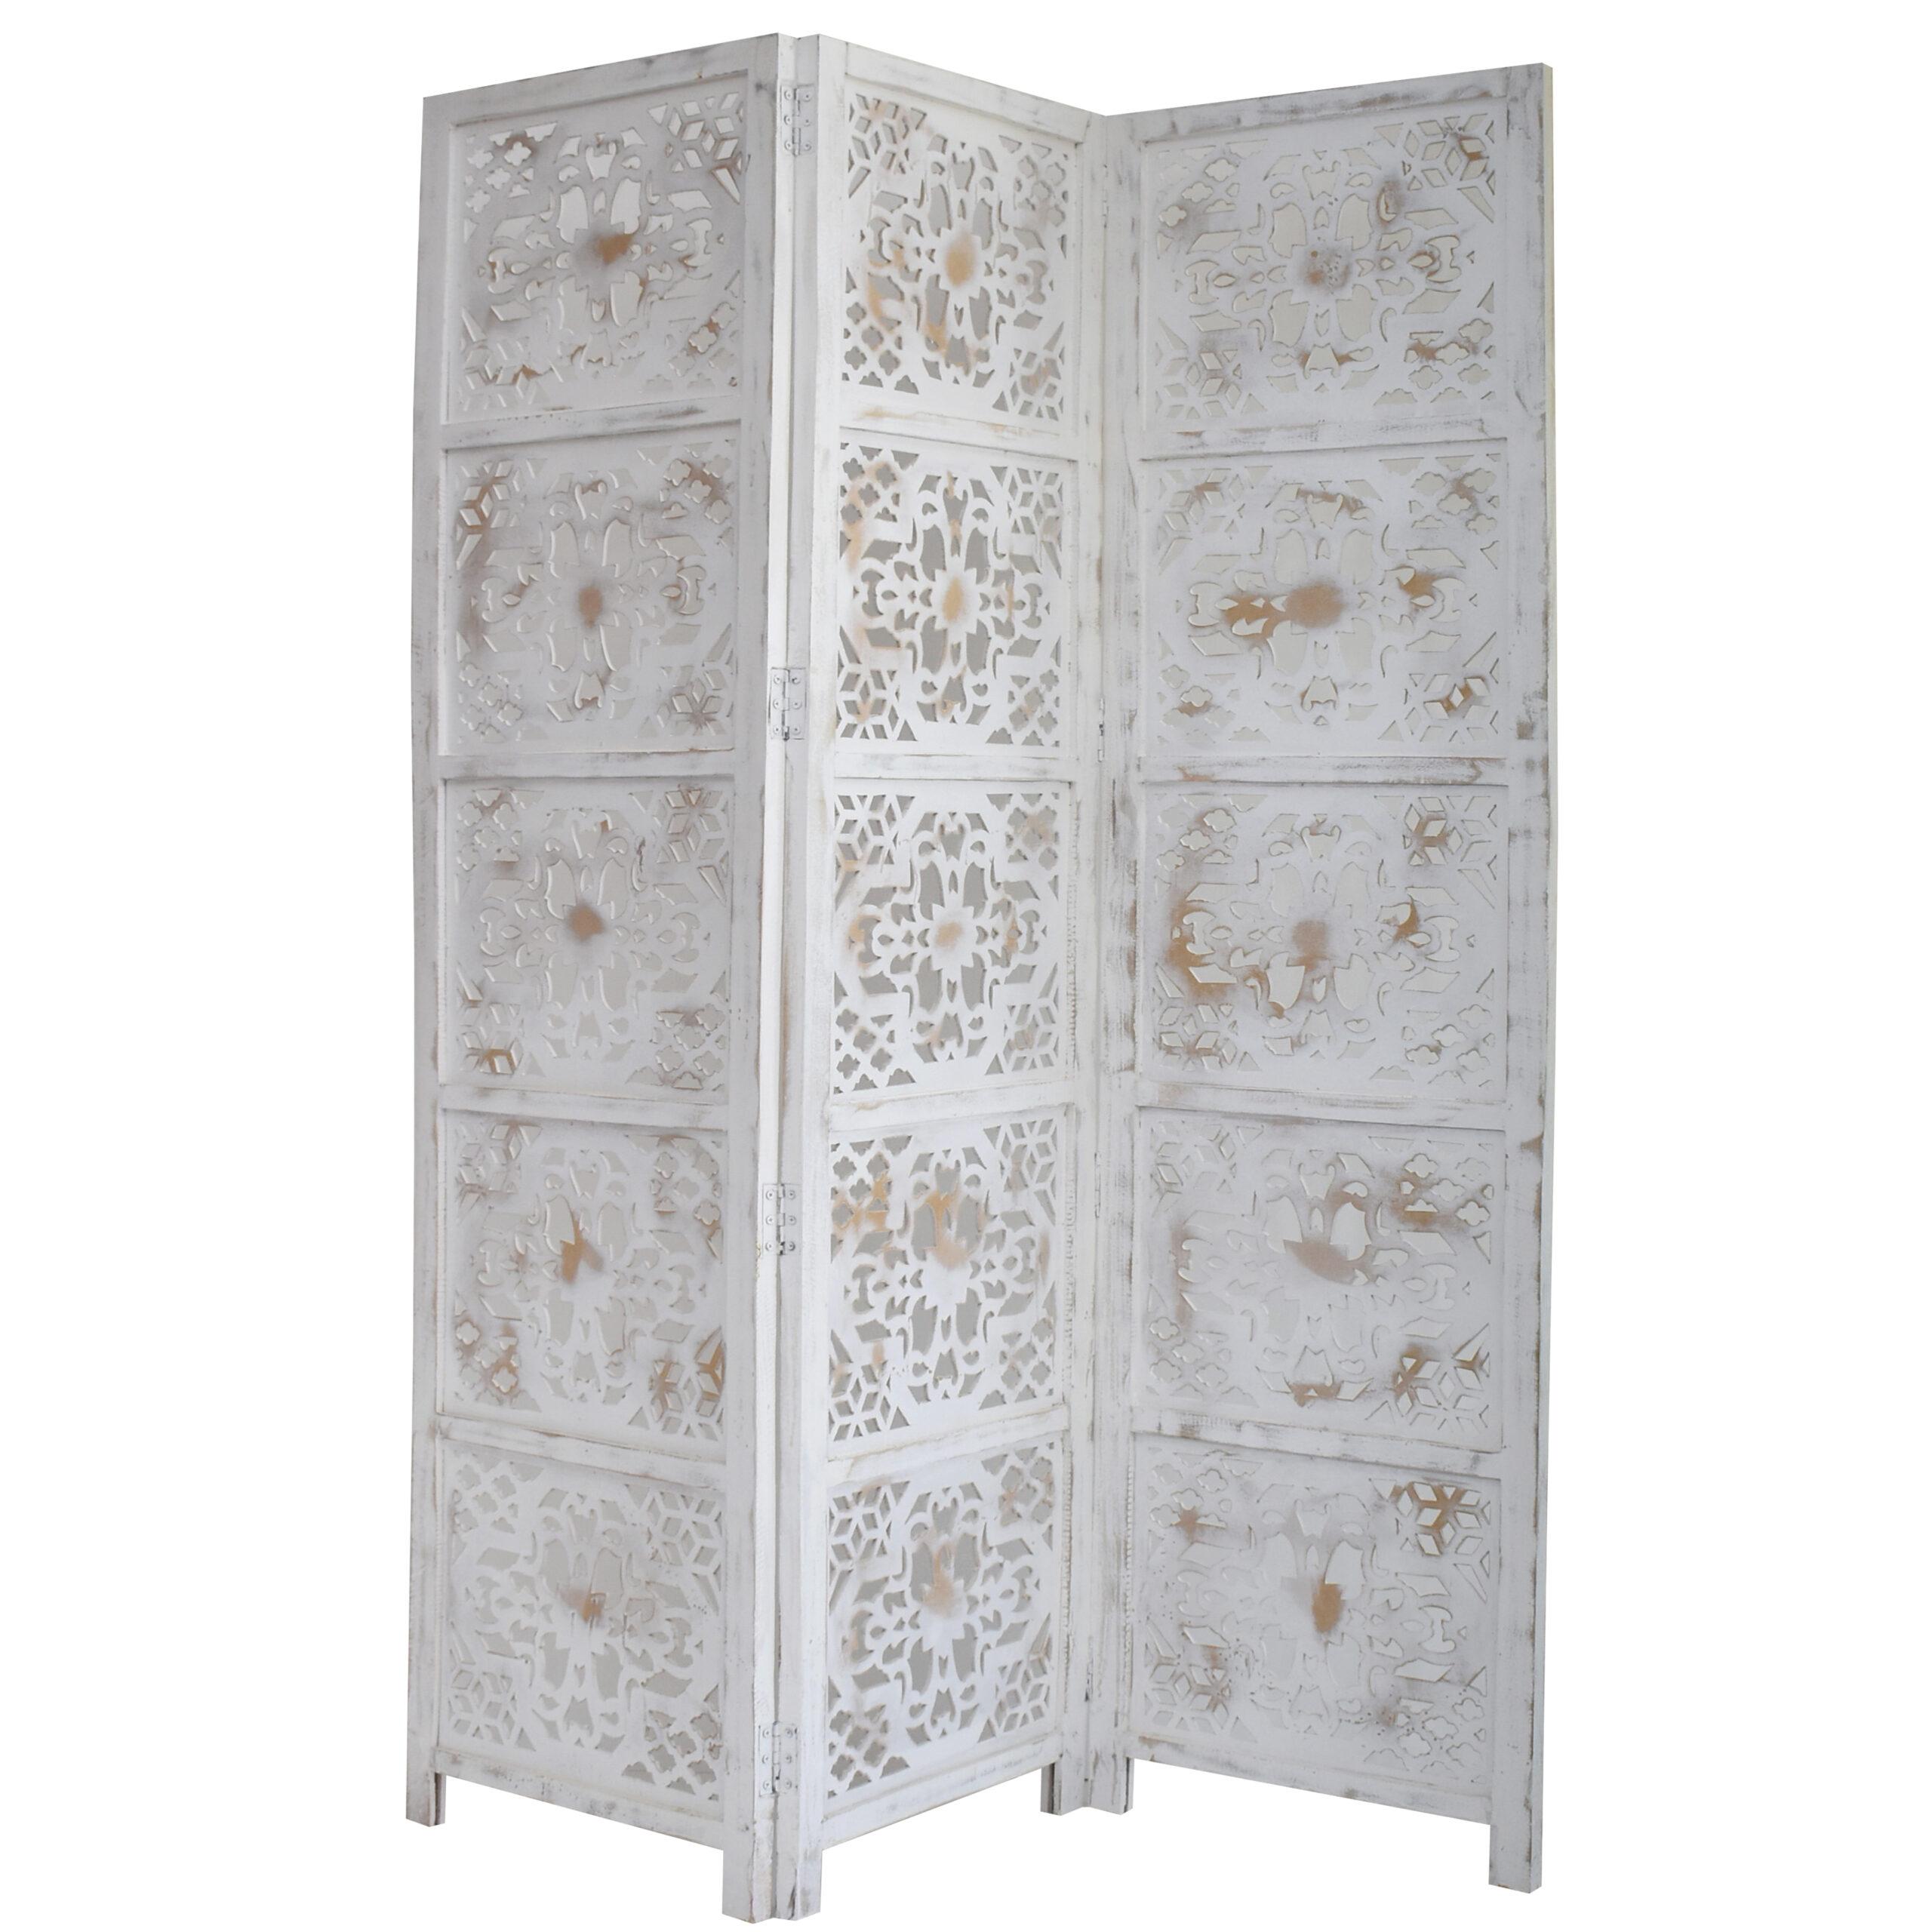 Dahlia 3 Panel Wood Screen, Antique White